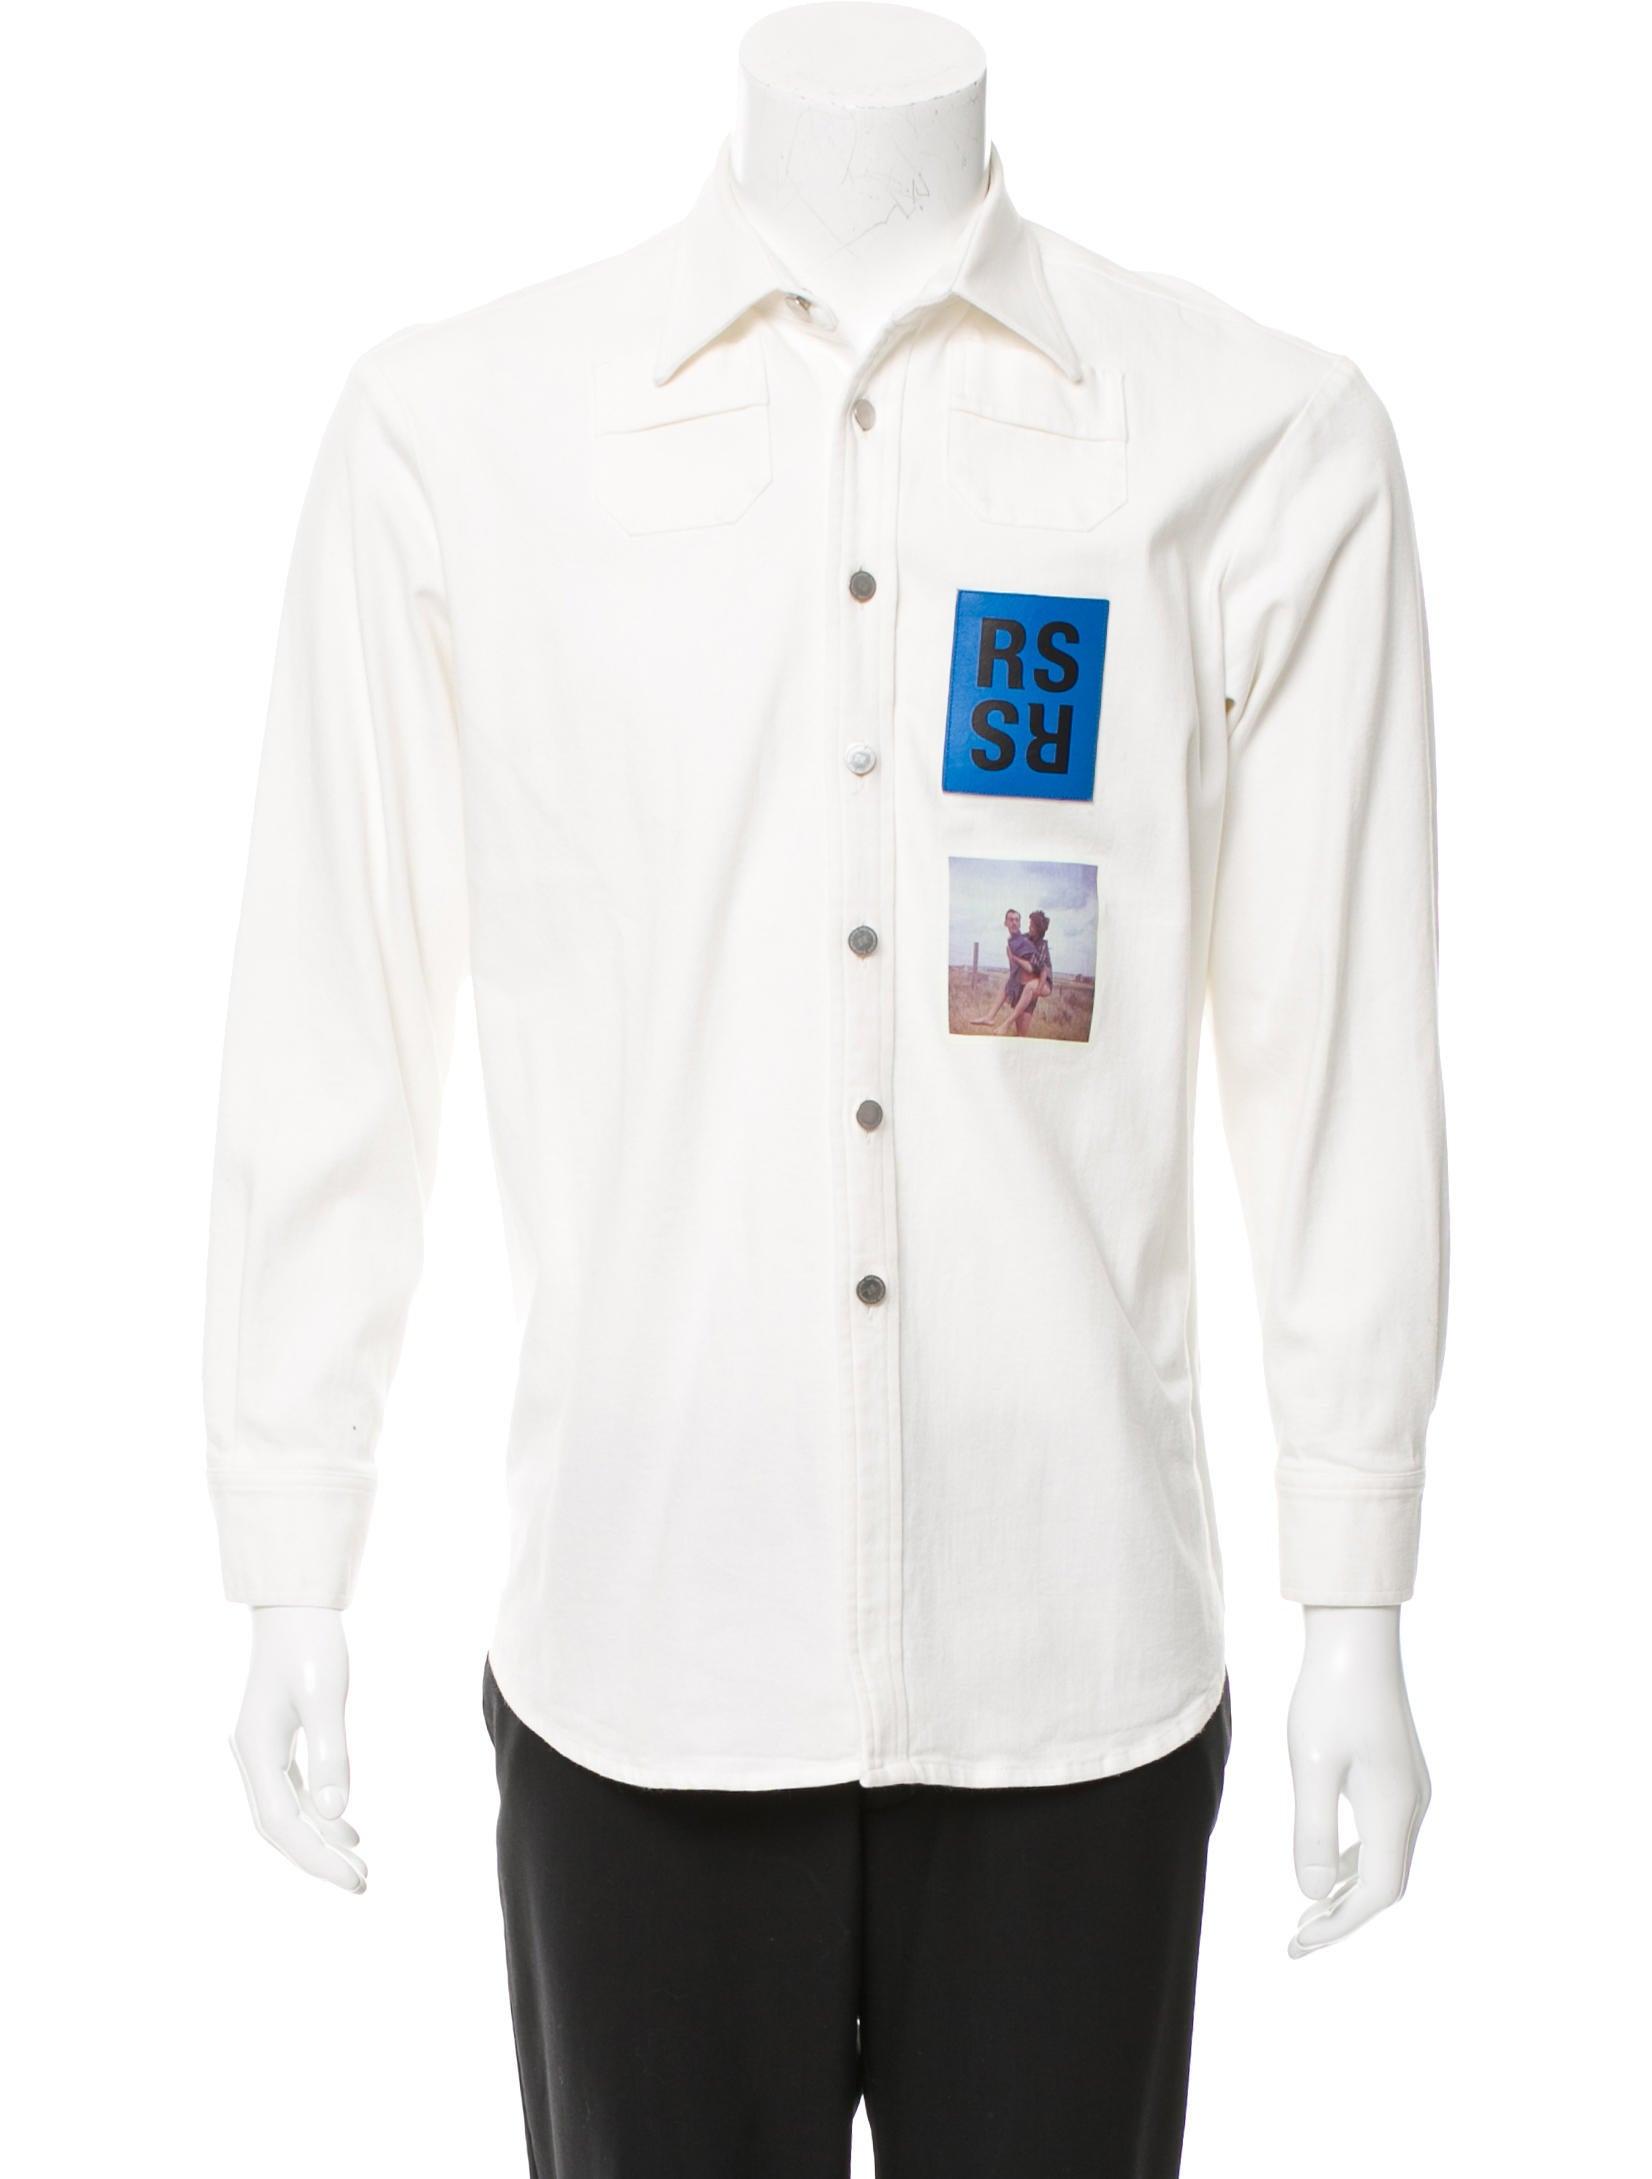 fddb098d8 Raf Simons Photo Patch Denim Shirt - Clothing - RAF20507 | The RealReal